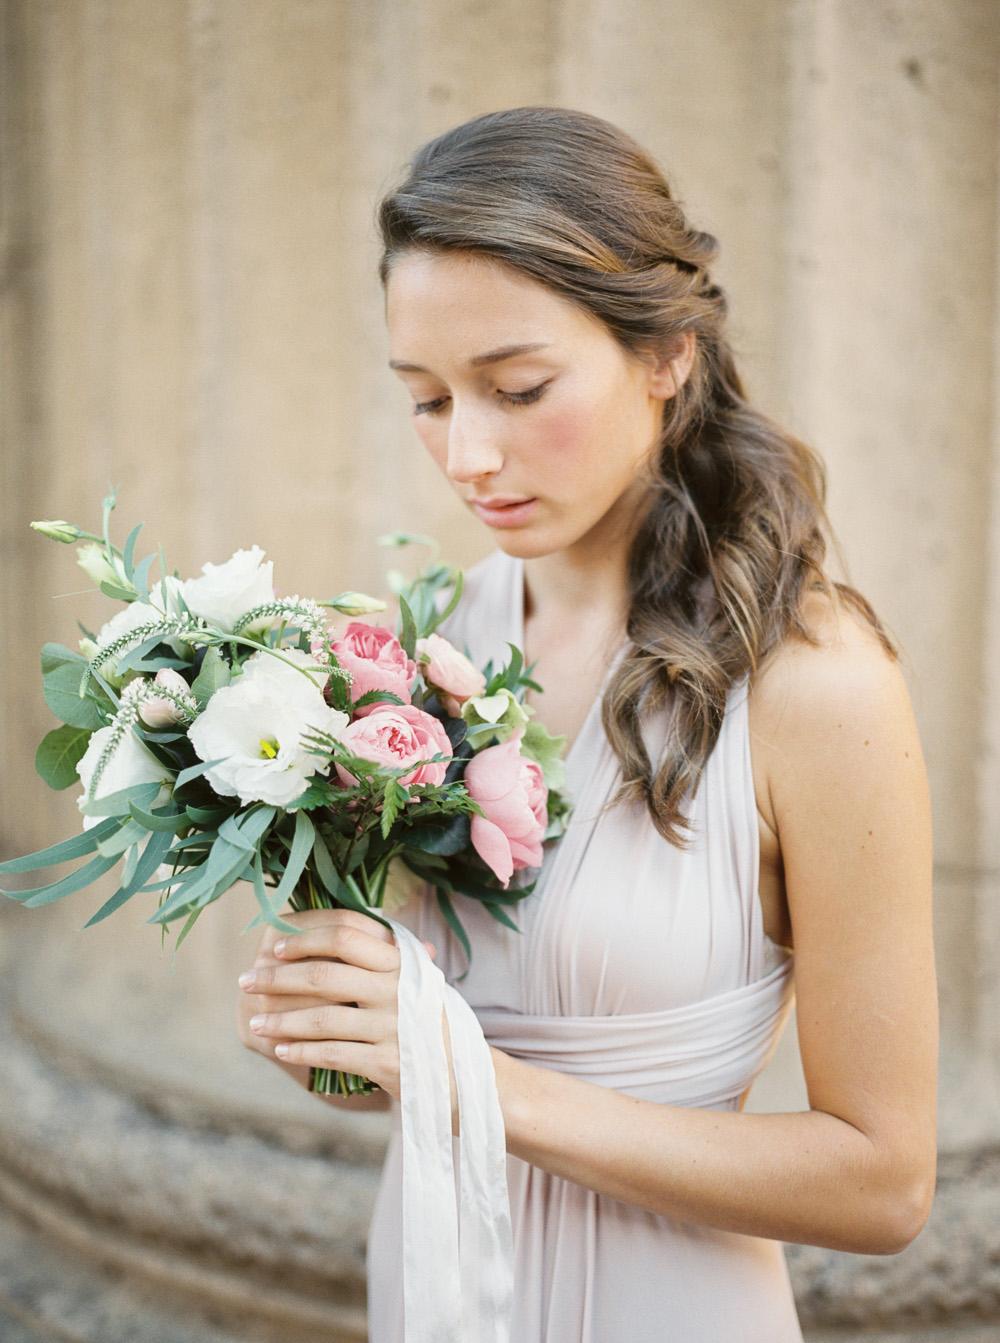 Romantic bridesmaid hair and makeup inspiration   | by Lara Lam photography